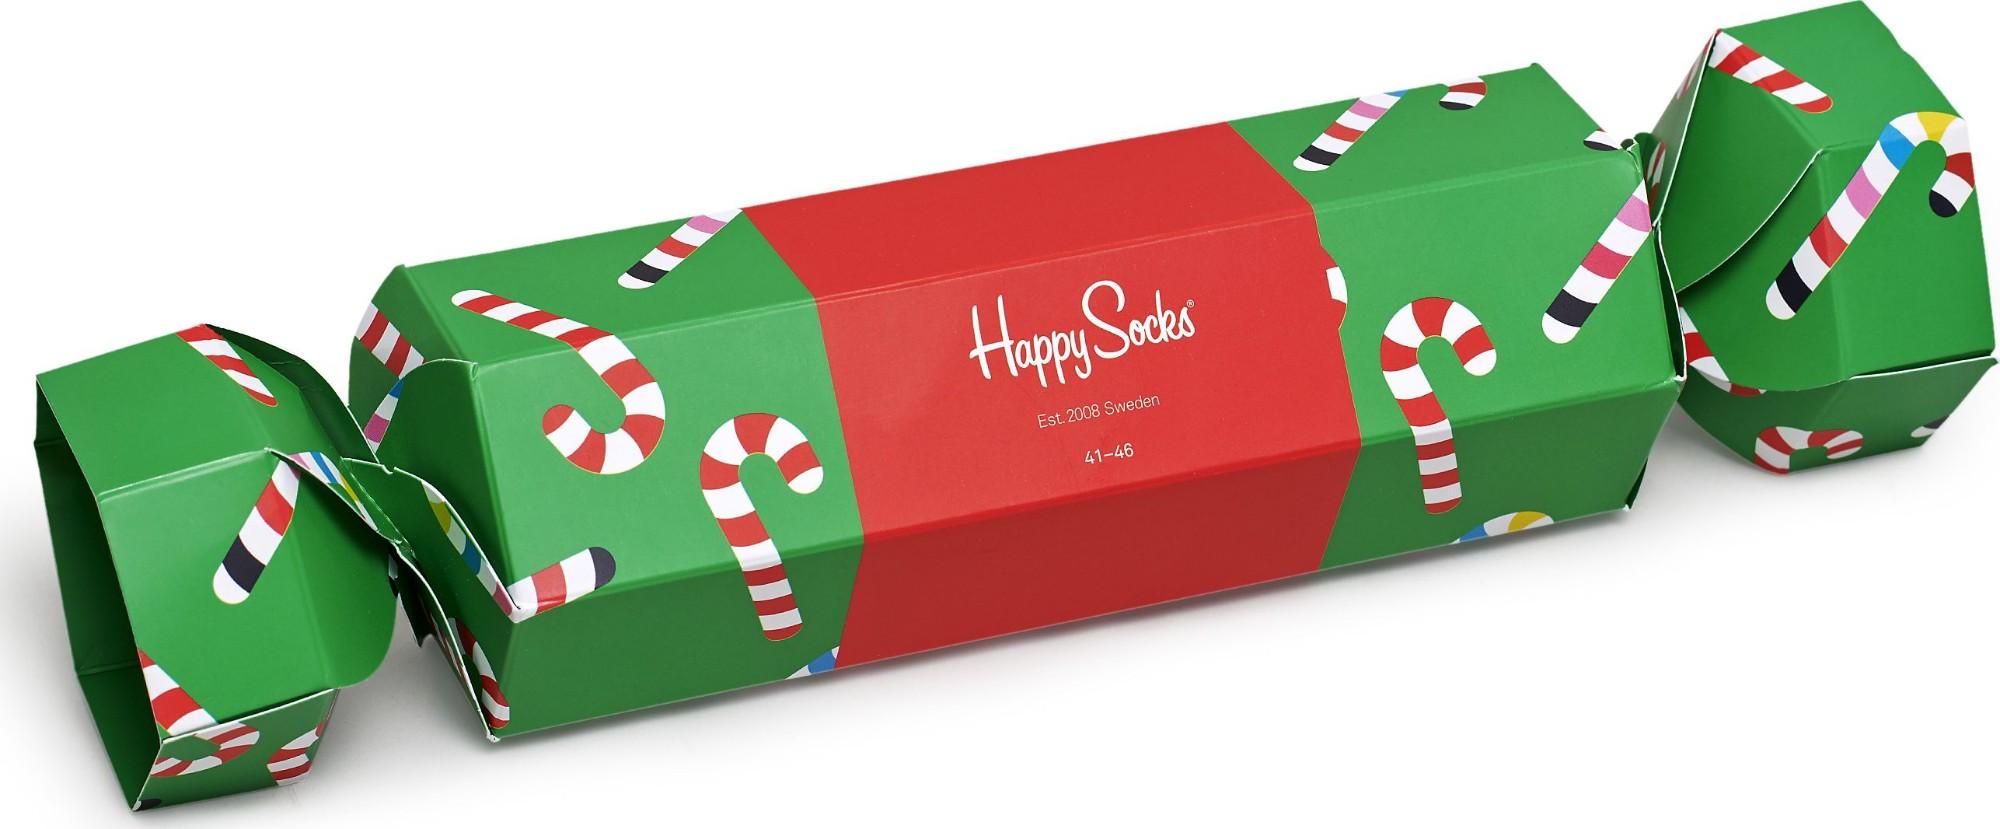 Happy Socks Christmas Cracker Candy Cane Gift Box Multi 7302 41-46